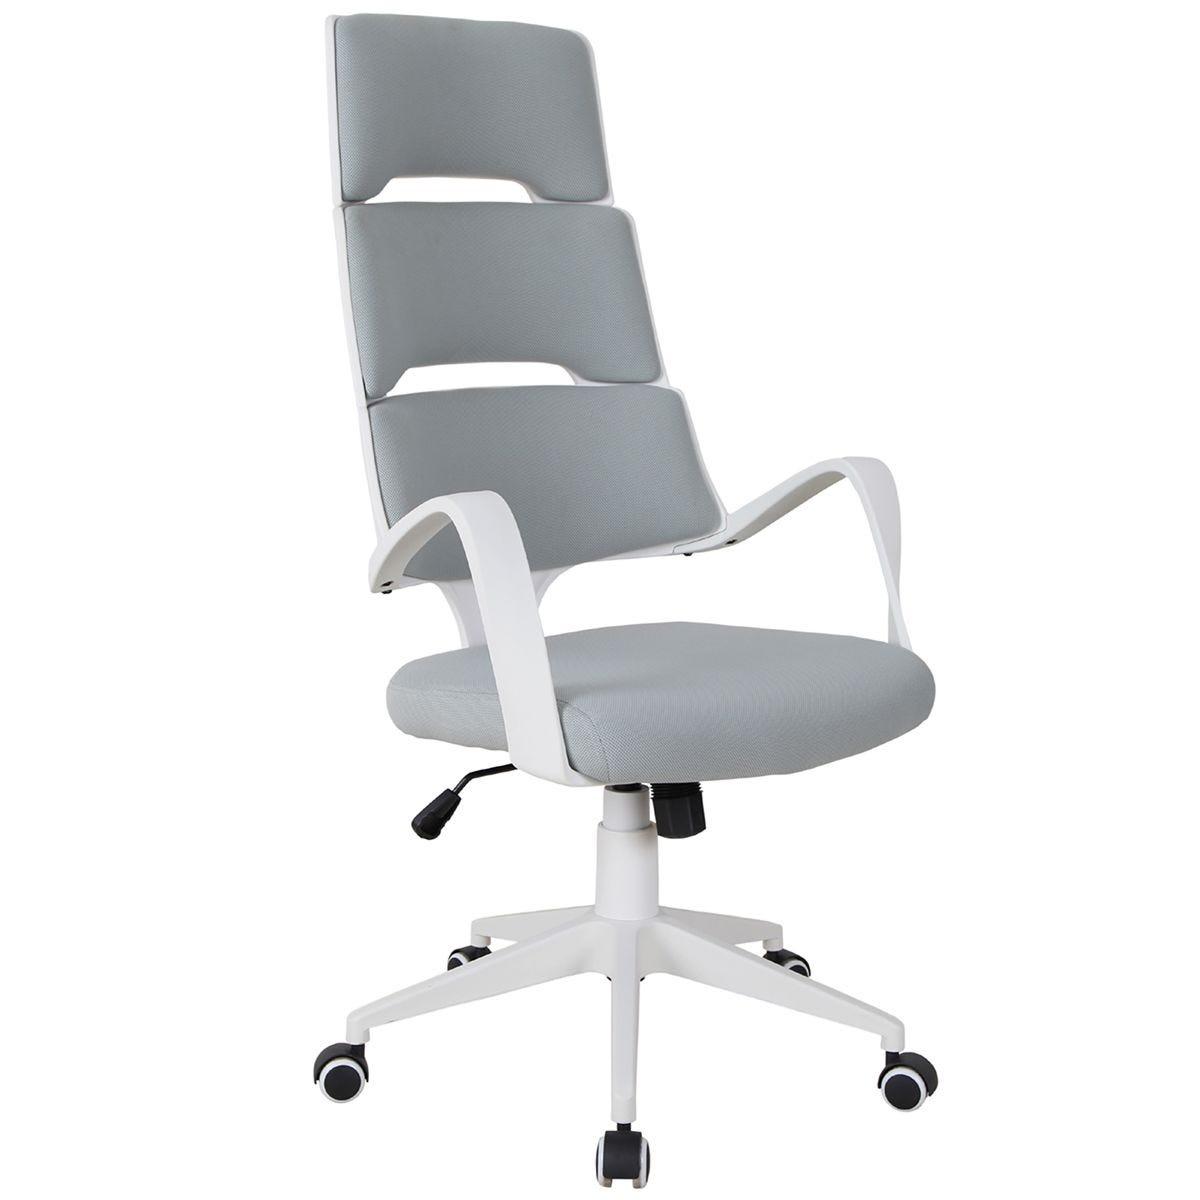 Solstice Hosta Linen Office Chair - White/Grey